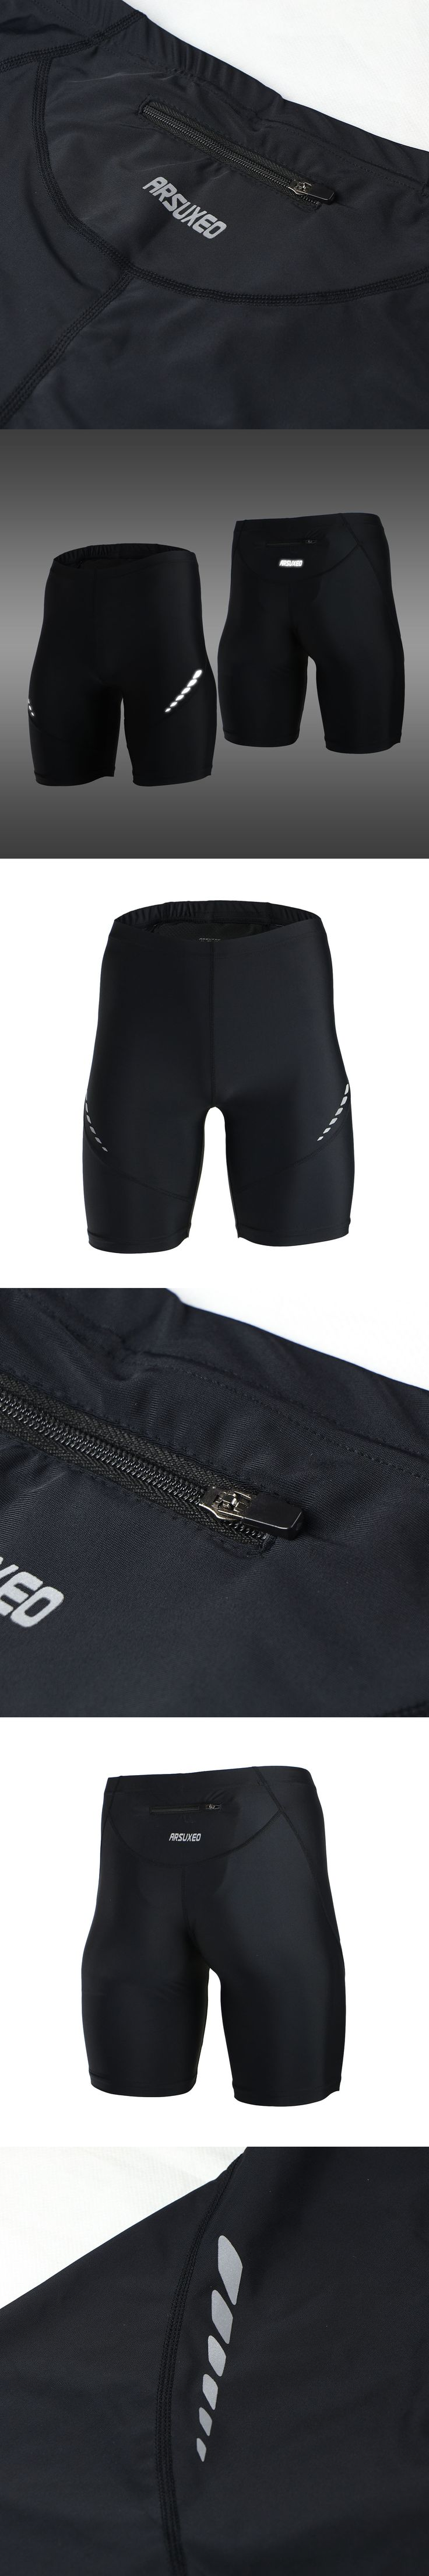 Pro Men's Running Tights Short Reflective Quick Dry Elastic Sports Leggings Compression Gym Fitness Shorts  Summer Sweatpants